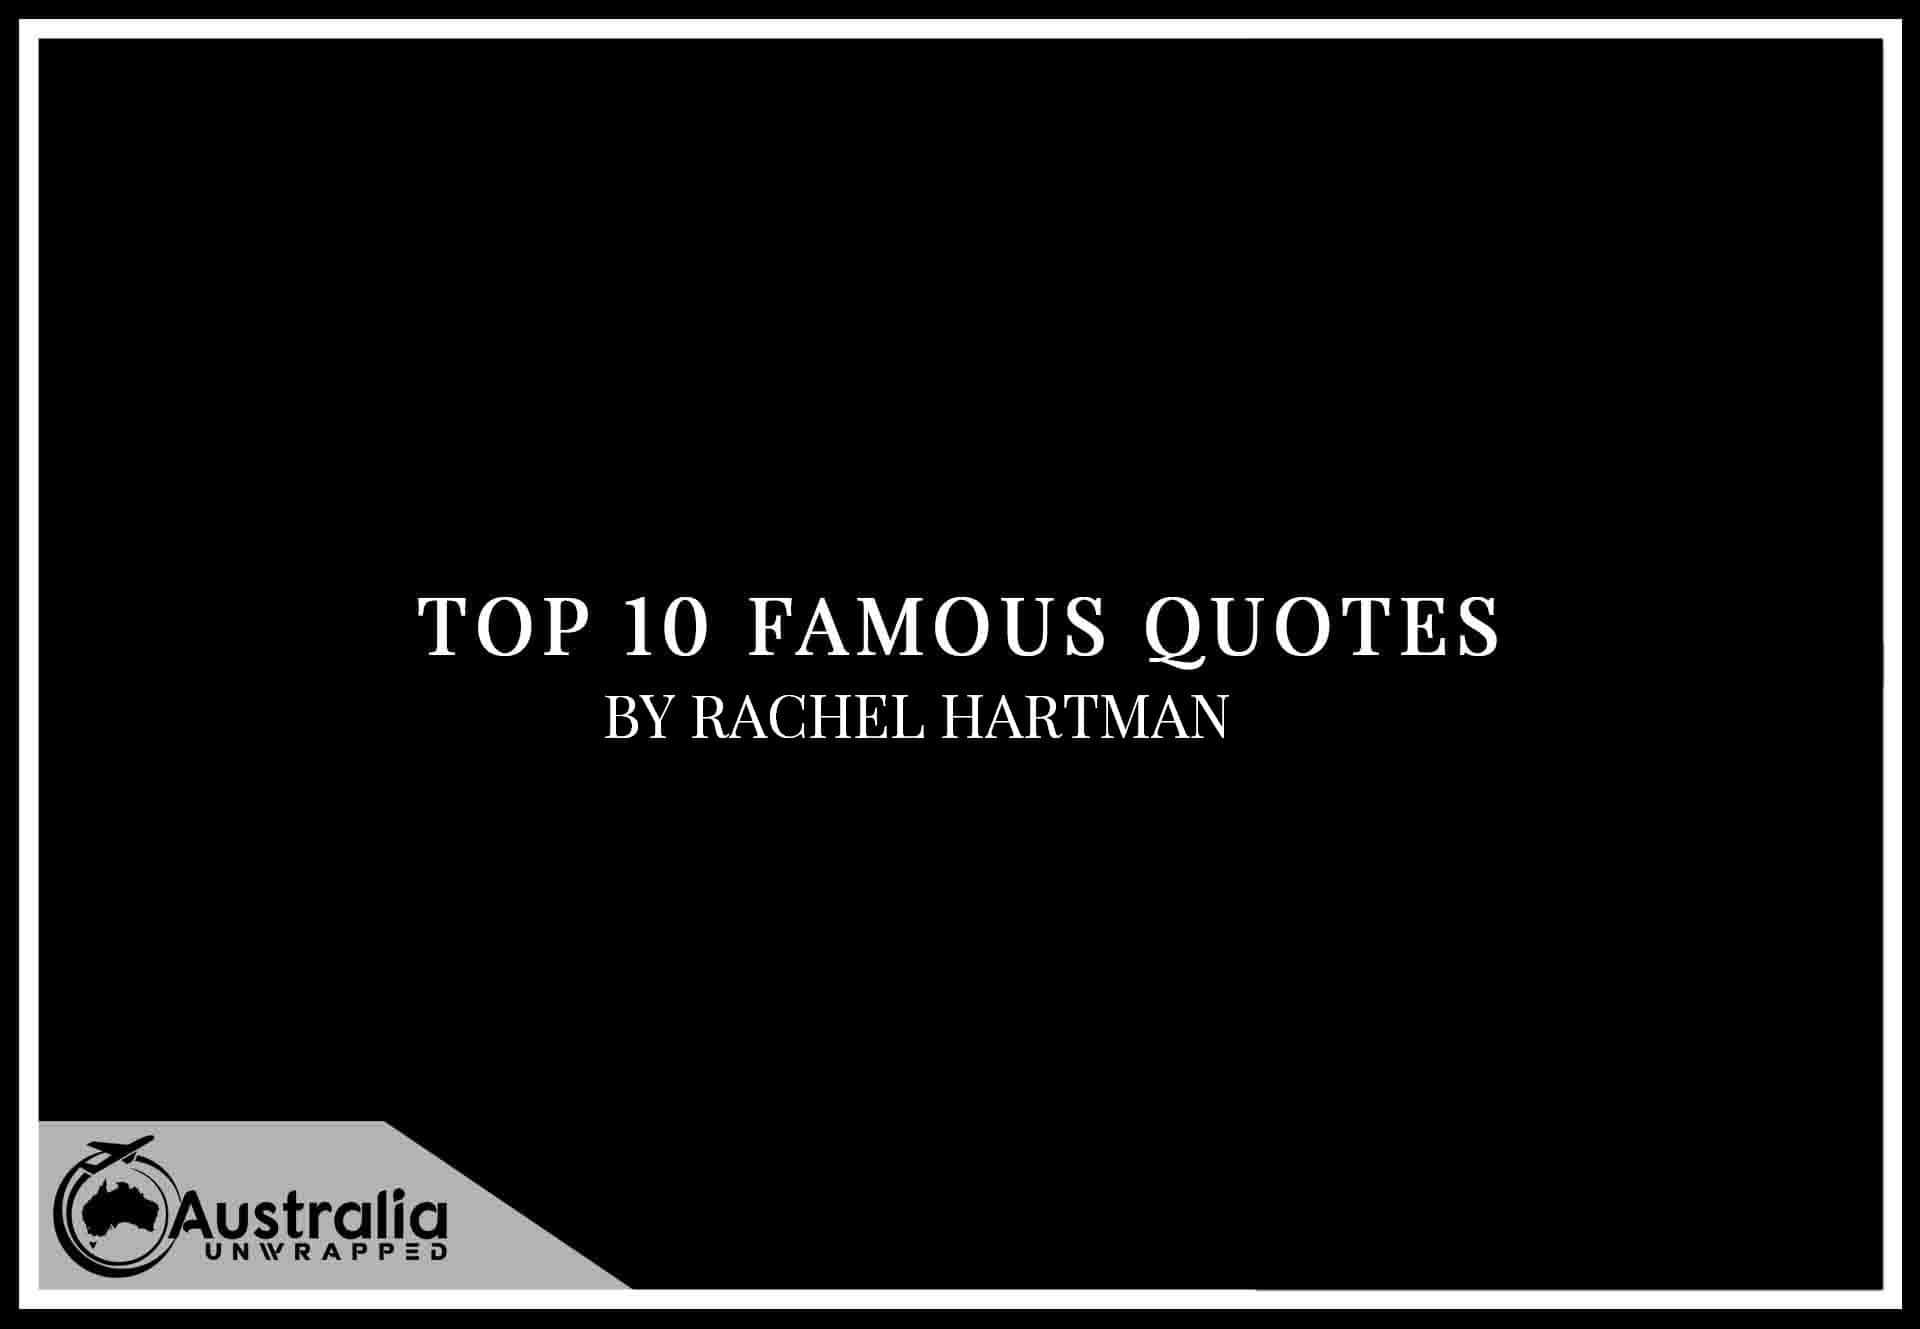 Top 10 Famous Quotes by Author Rachel Hartman